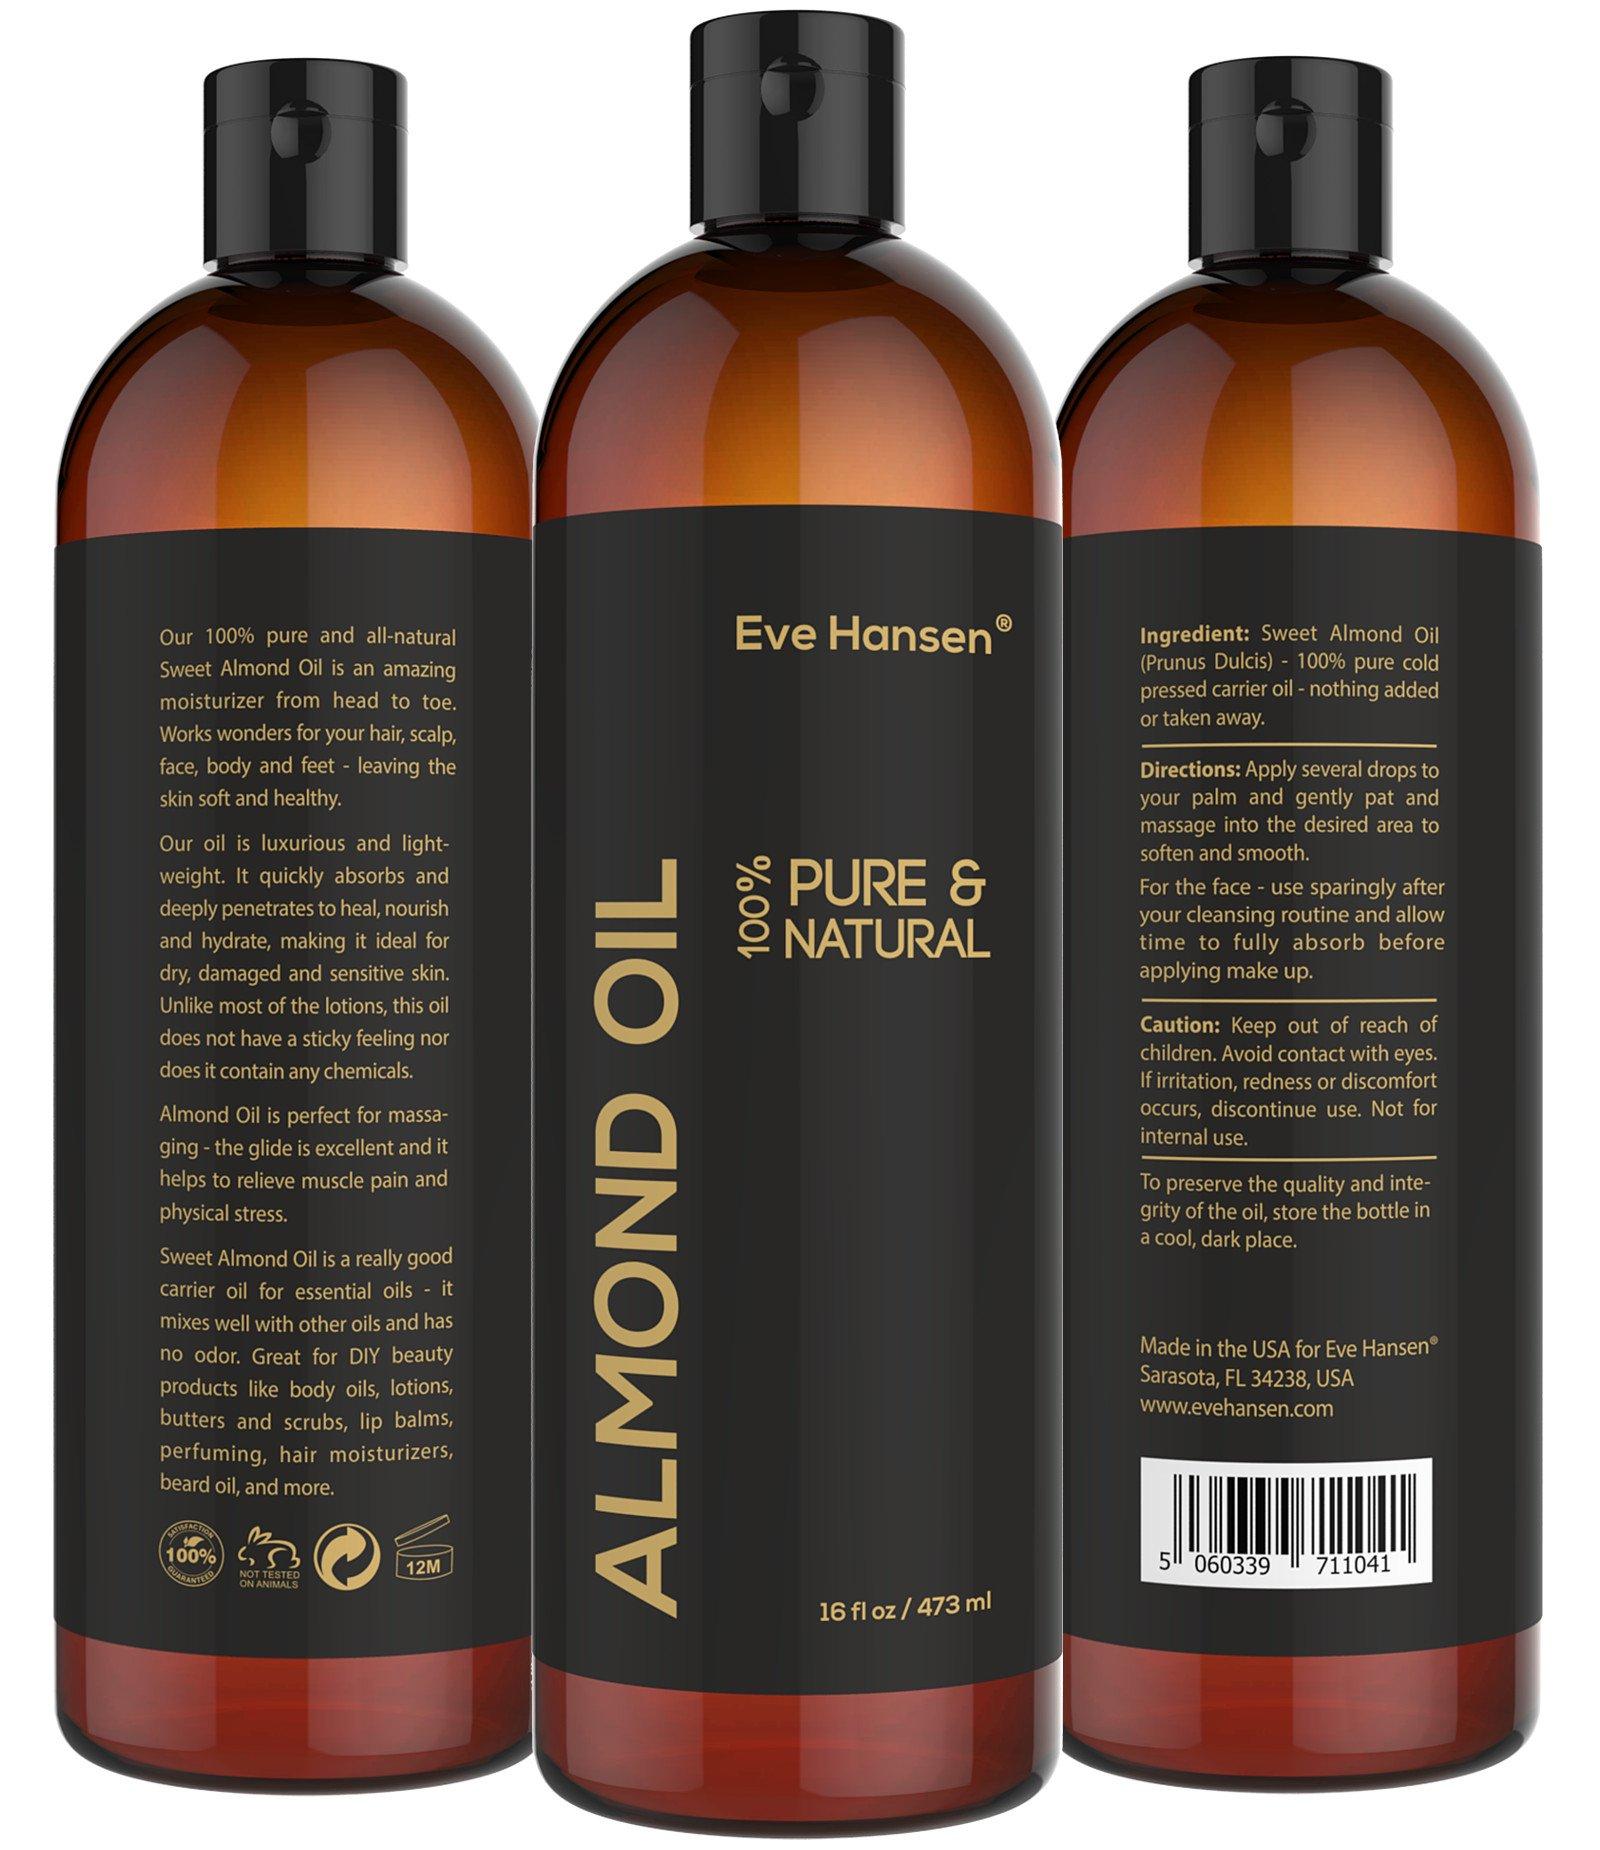 Sweet Almond Oil - Organic Moisturizer for Skin, Face, Body, Hair, Eve Hansen, 16 ounces